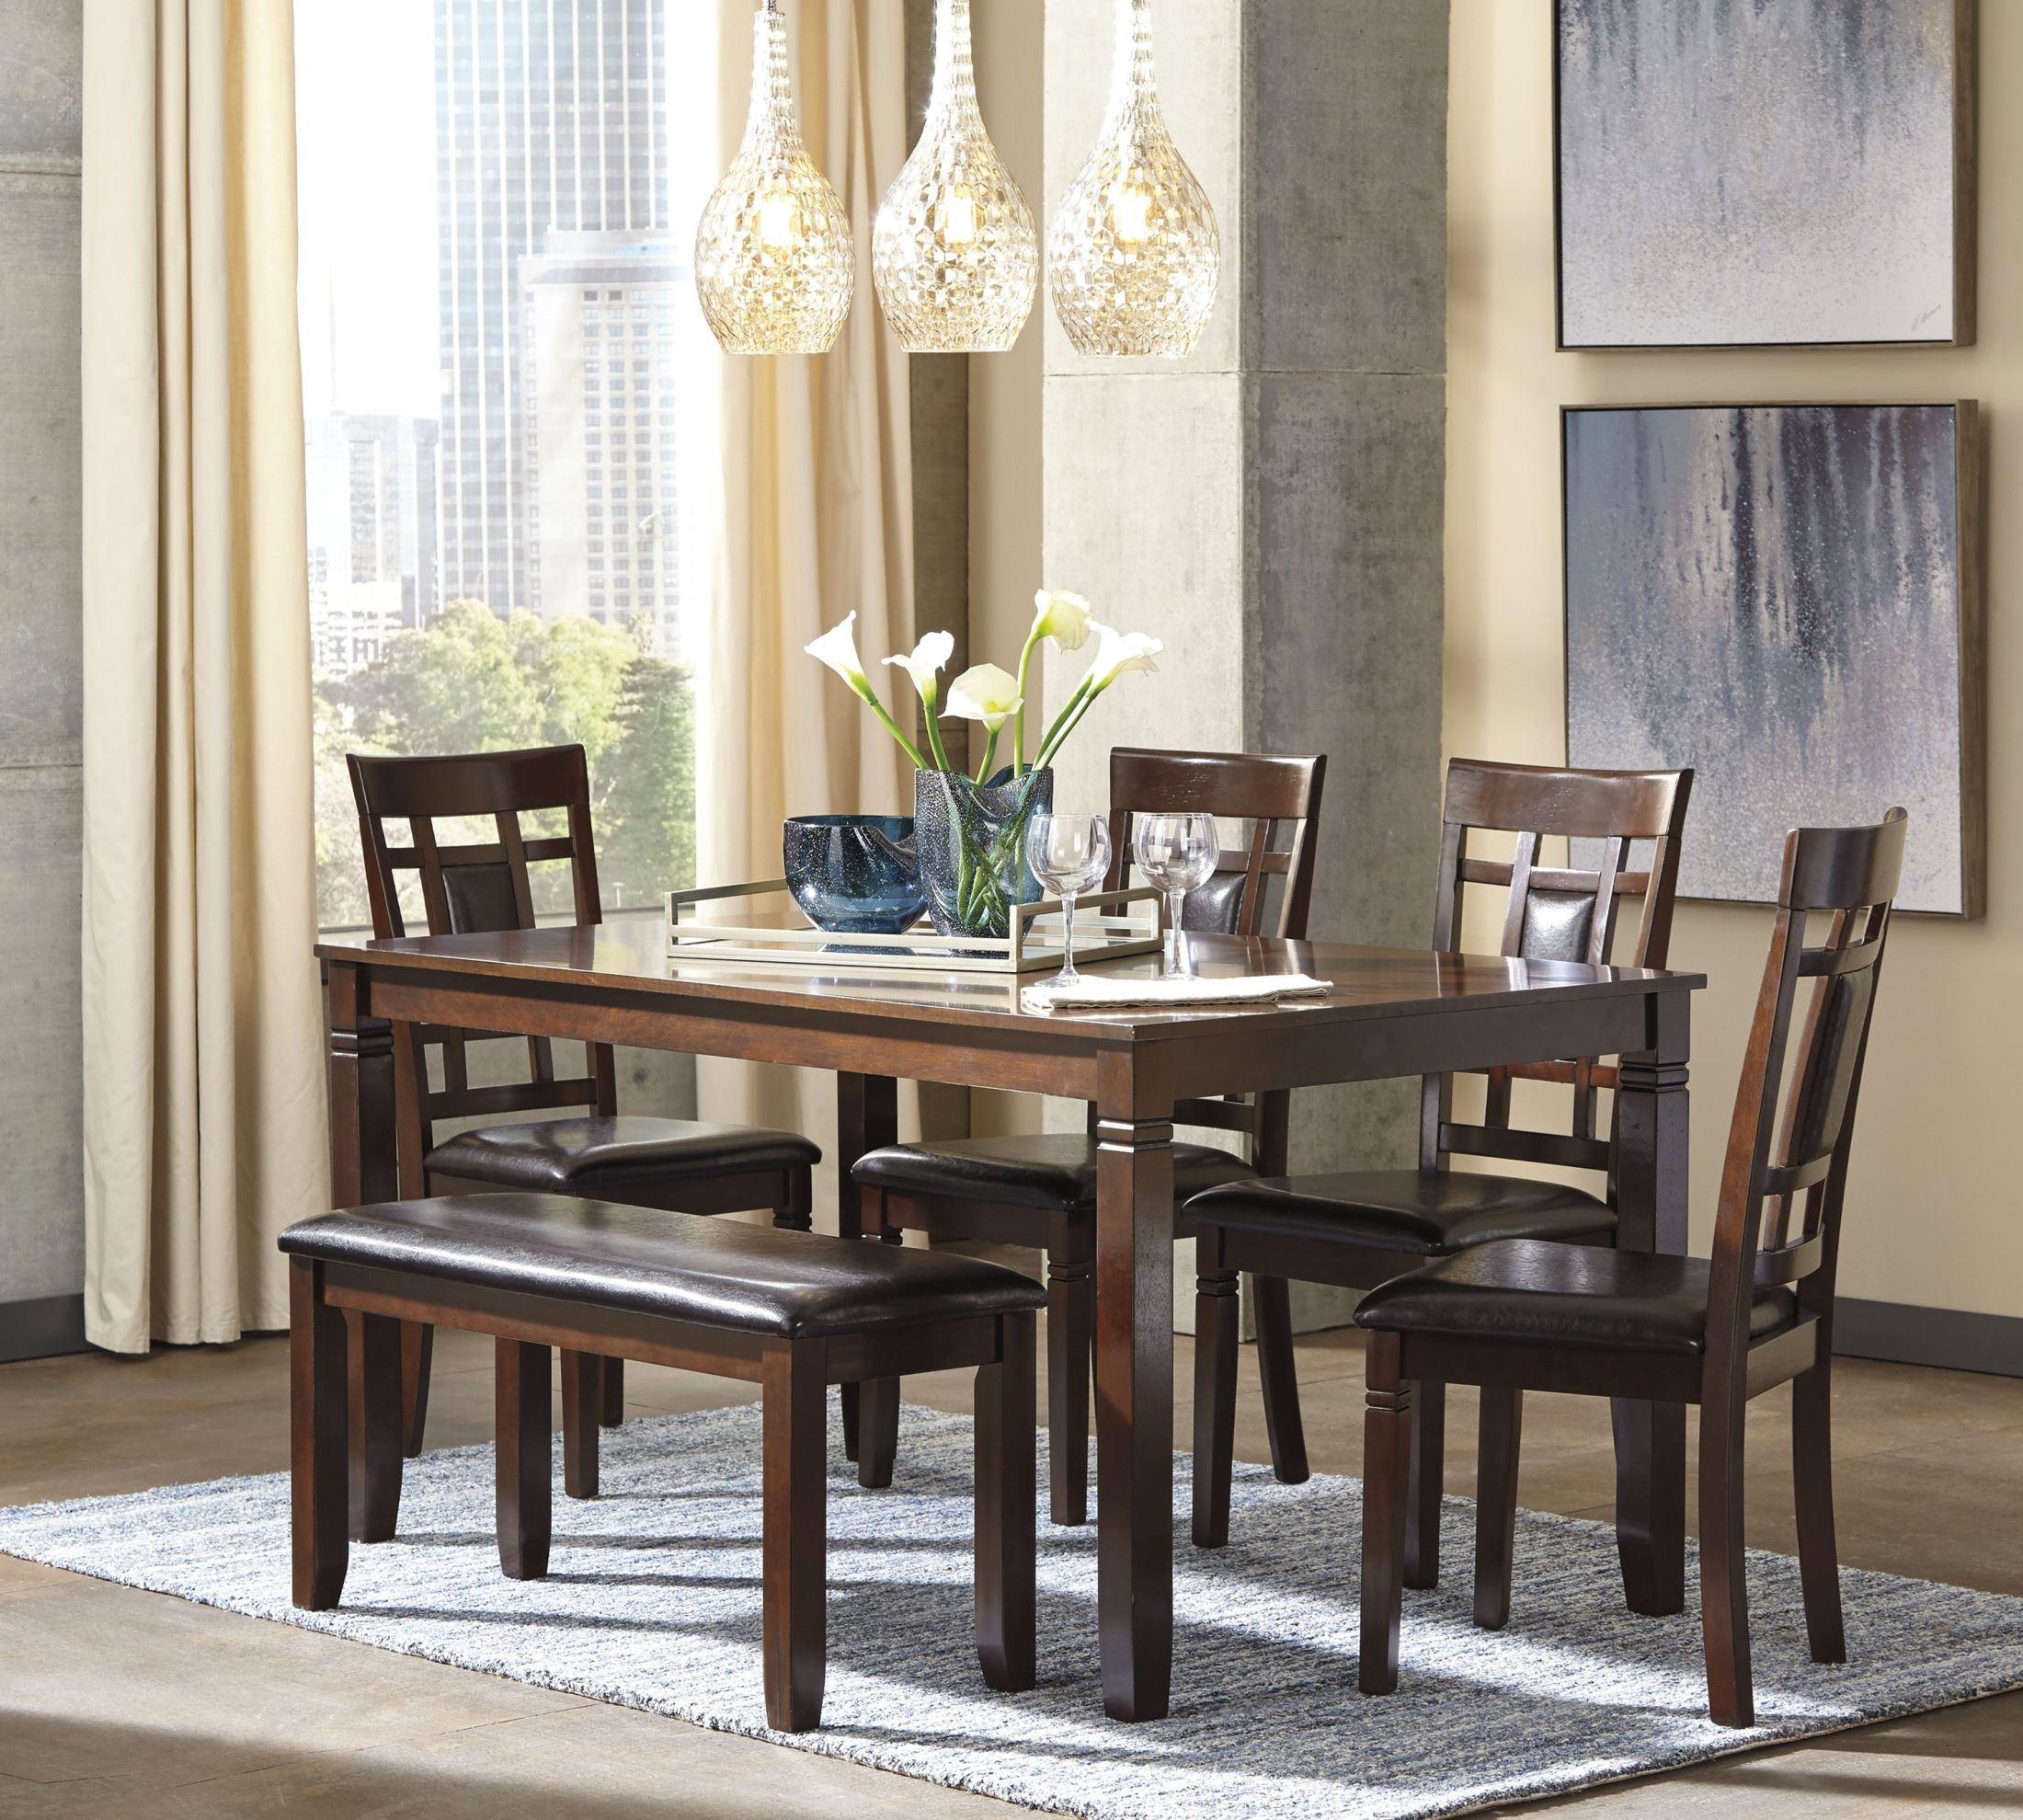 Bennox brown 6 piece rectangular dining room set d384 325 for Brown dining room set